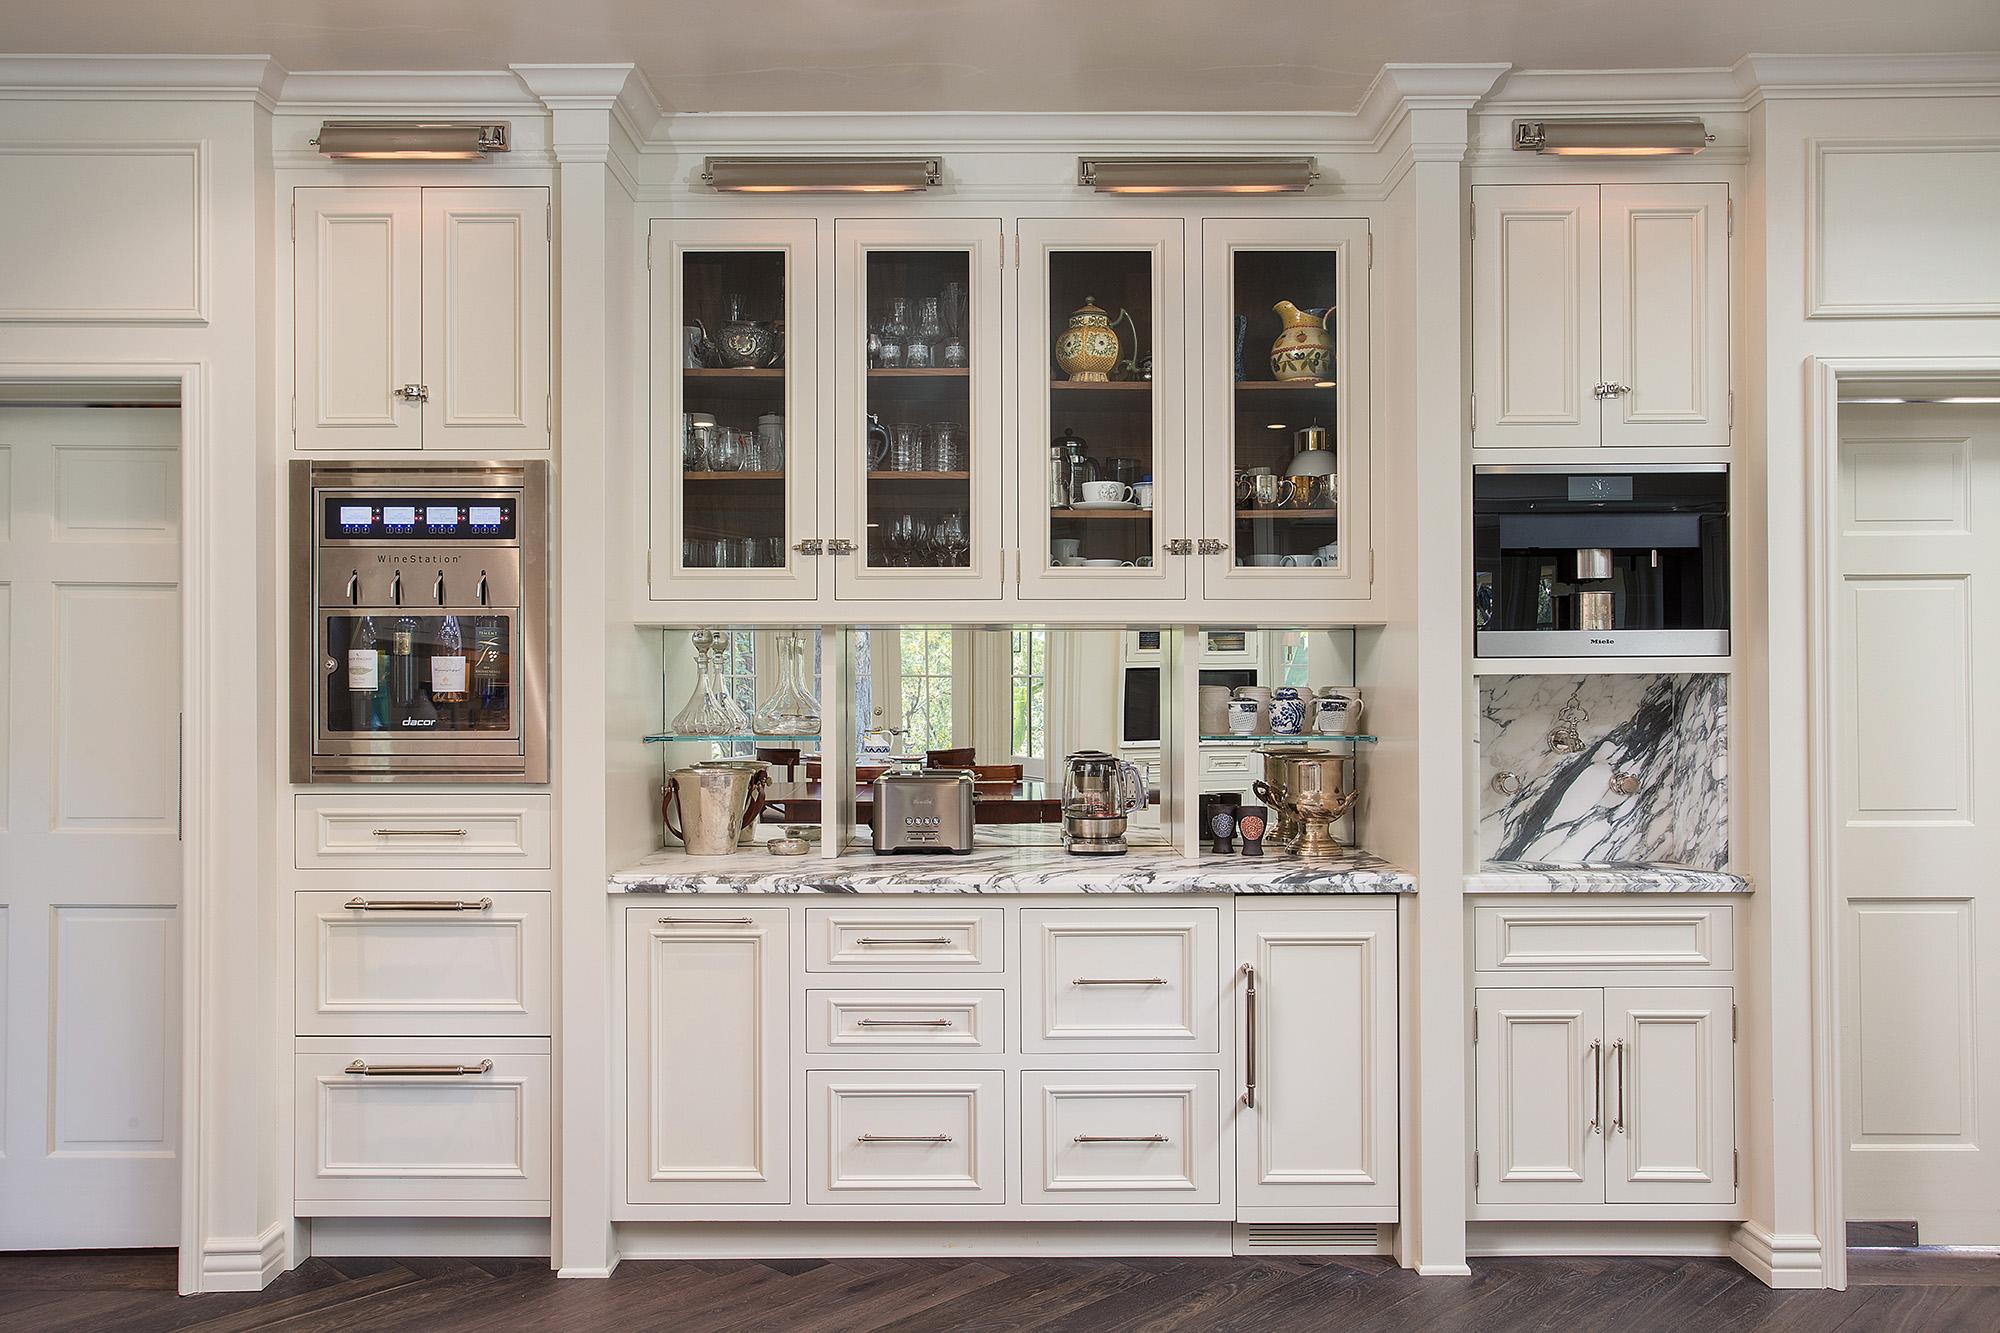 kitchen-built-in-marble-chelsea.jpg